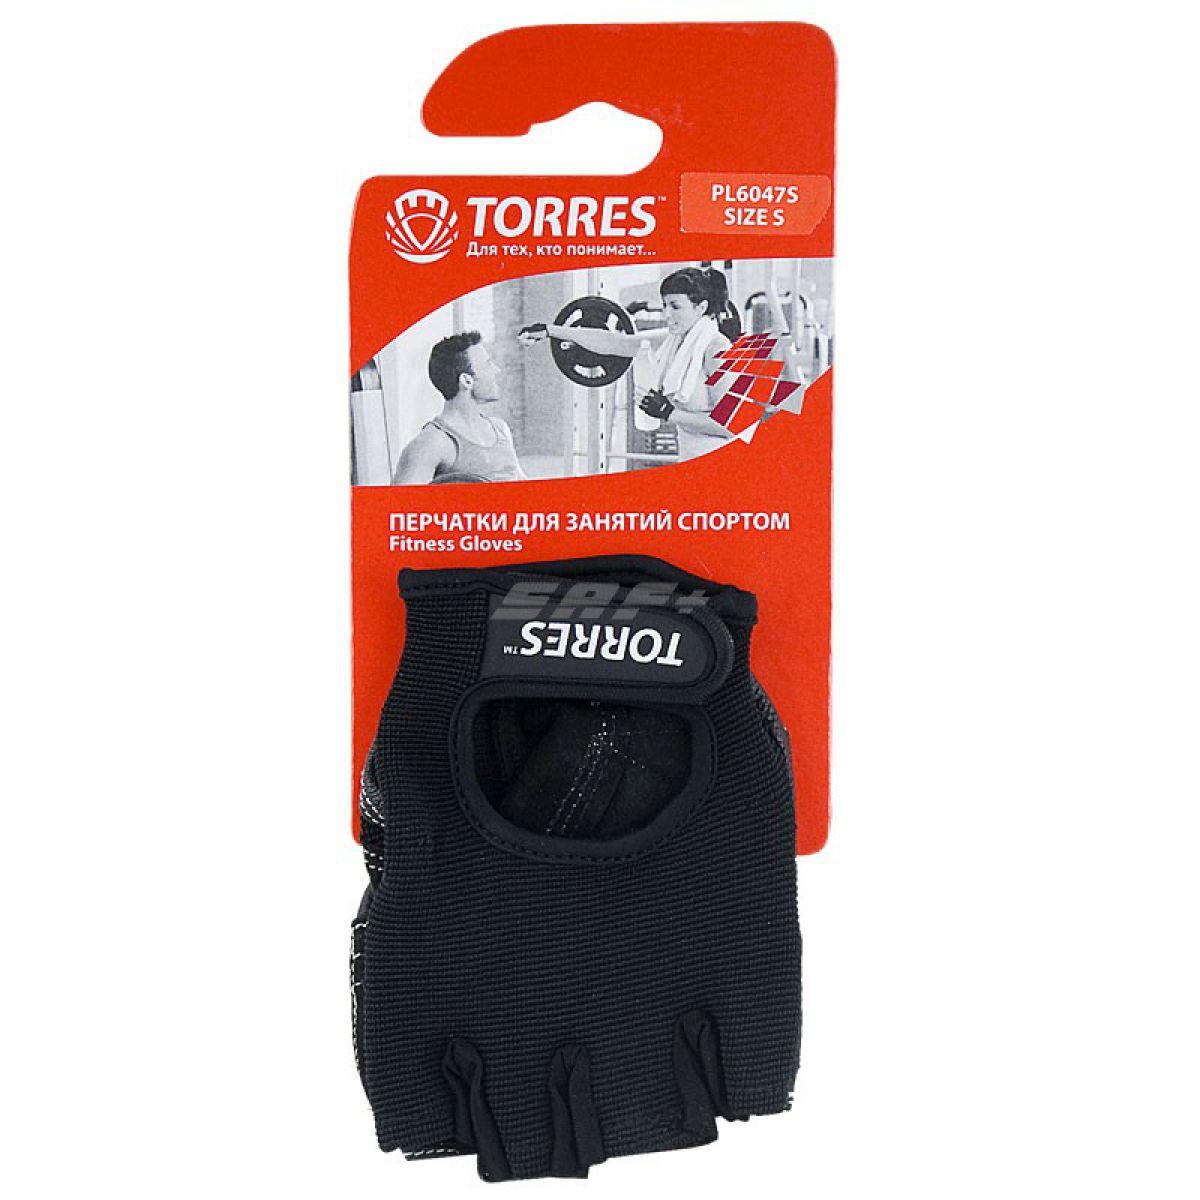 TORRES Перчатки для занятий спортом